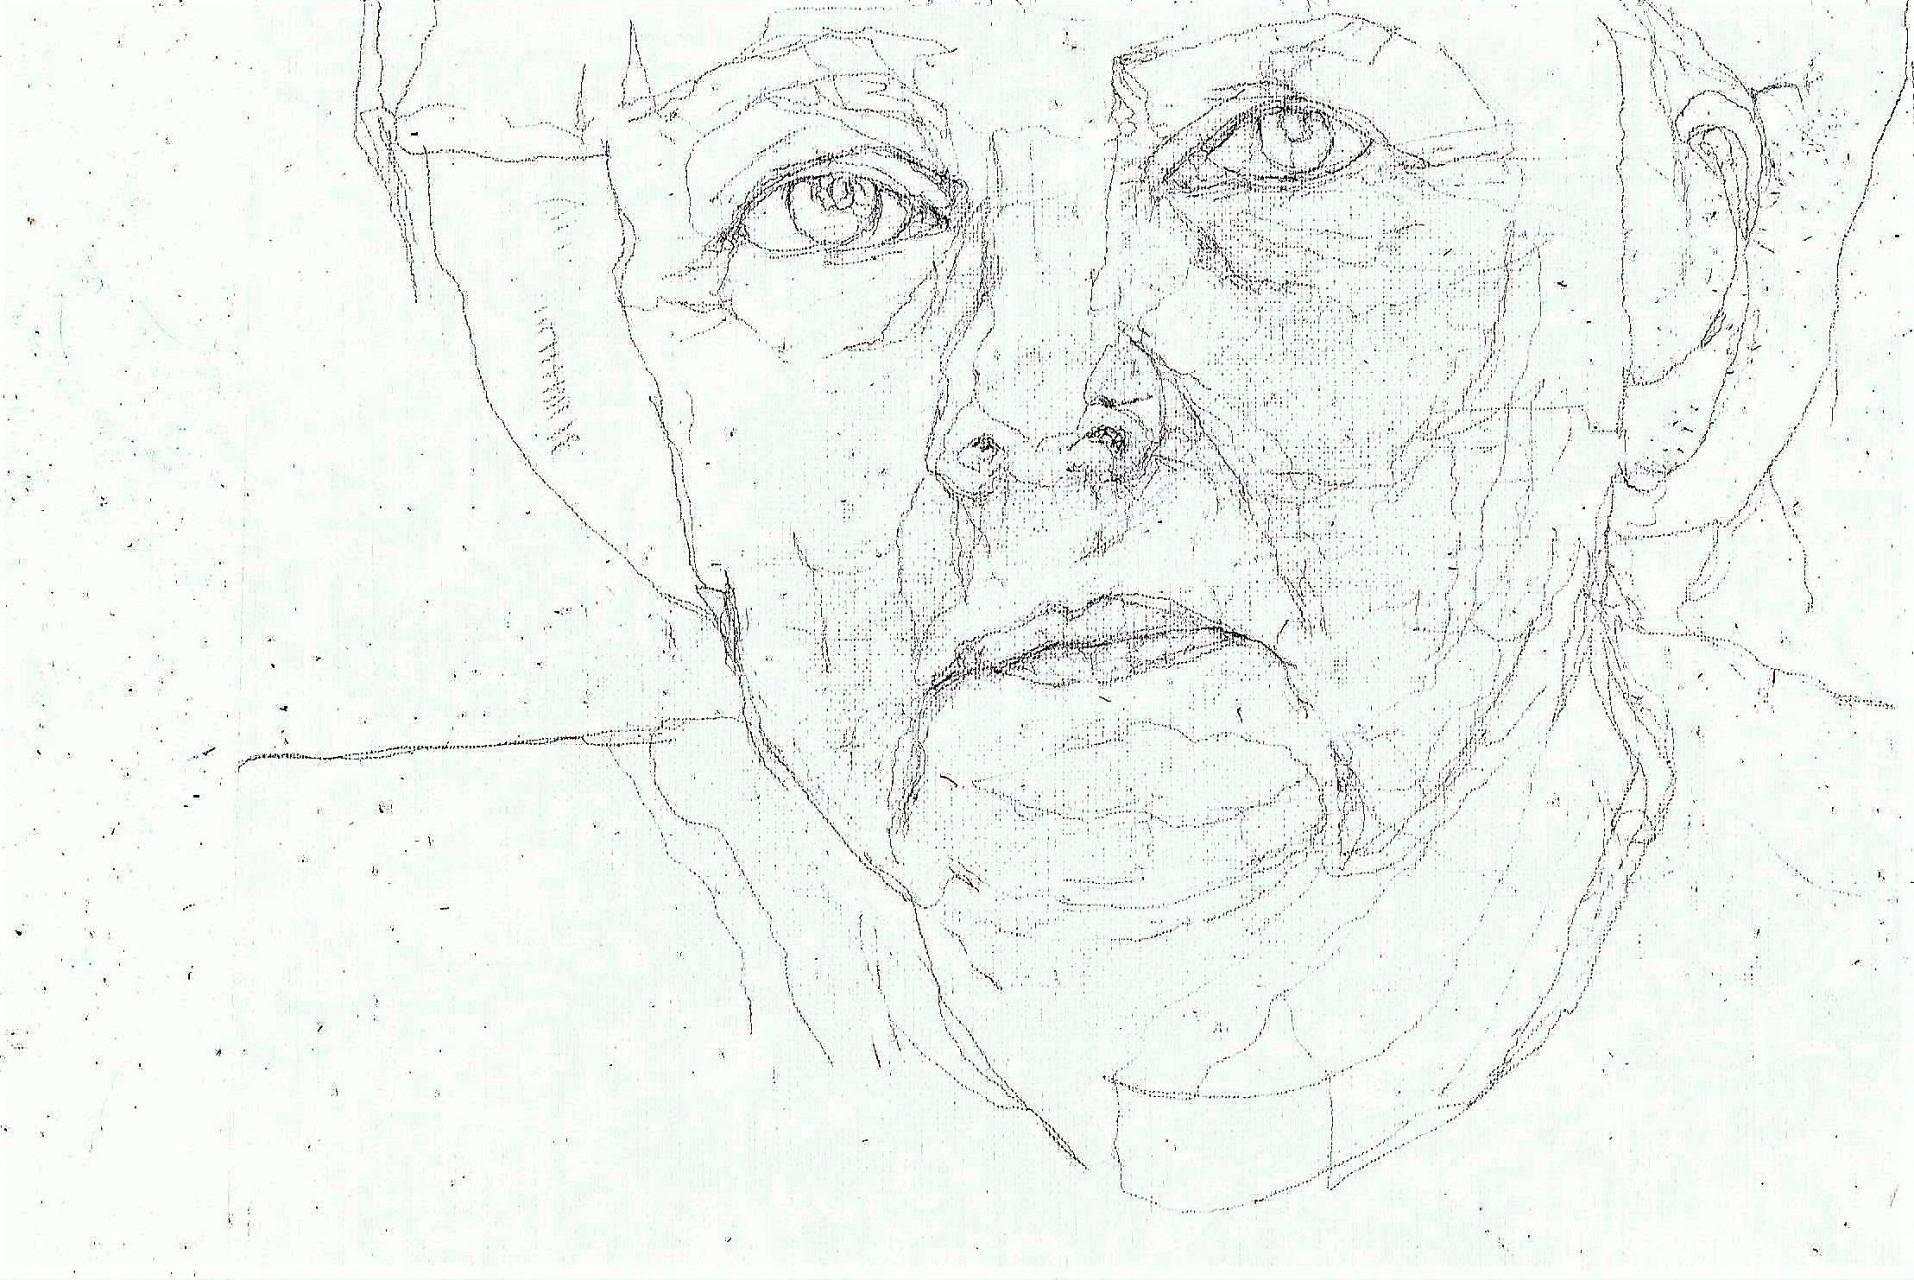 365 dagen een portret 67 Angela Merkel, premier Duitsland Potlood 19c25